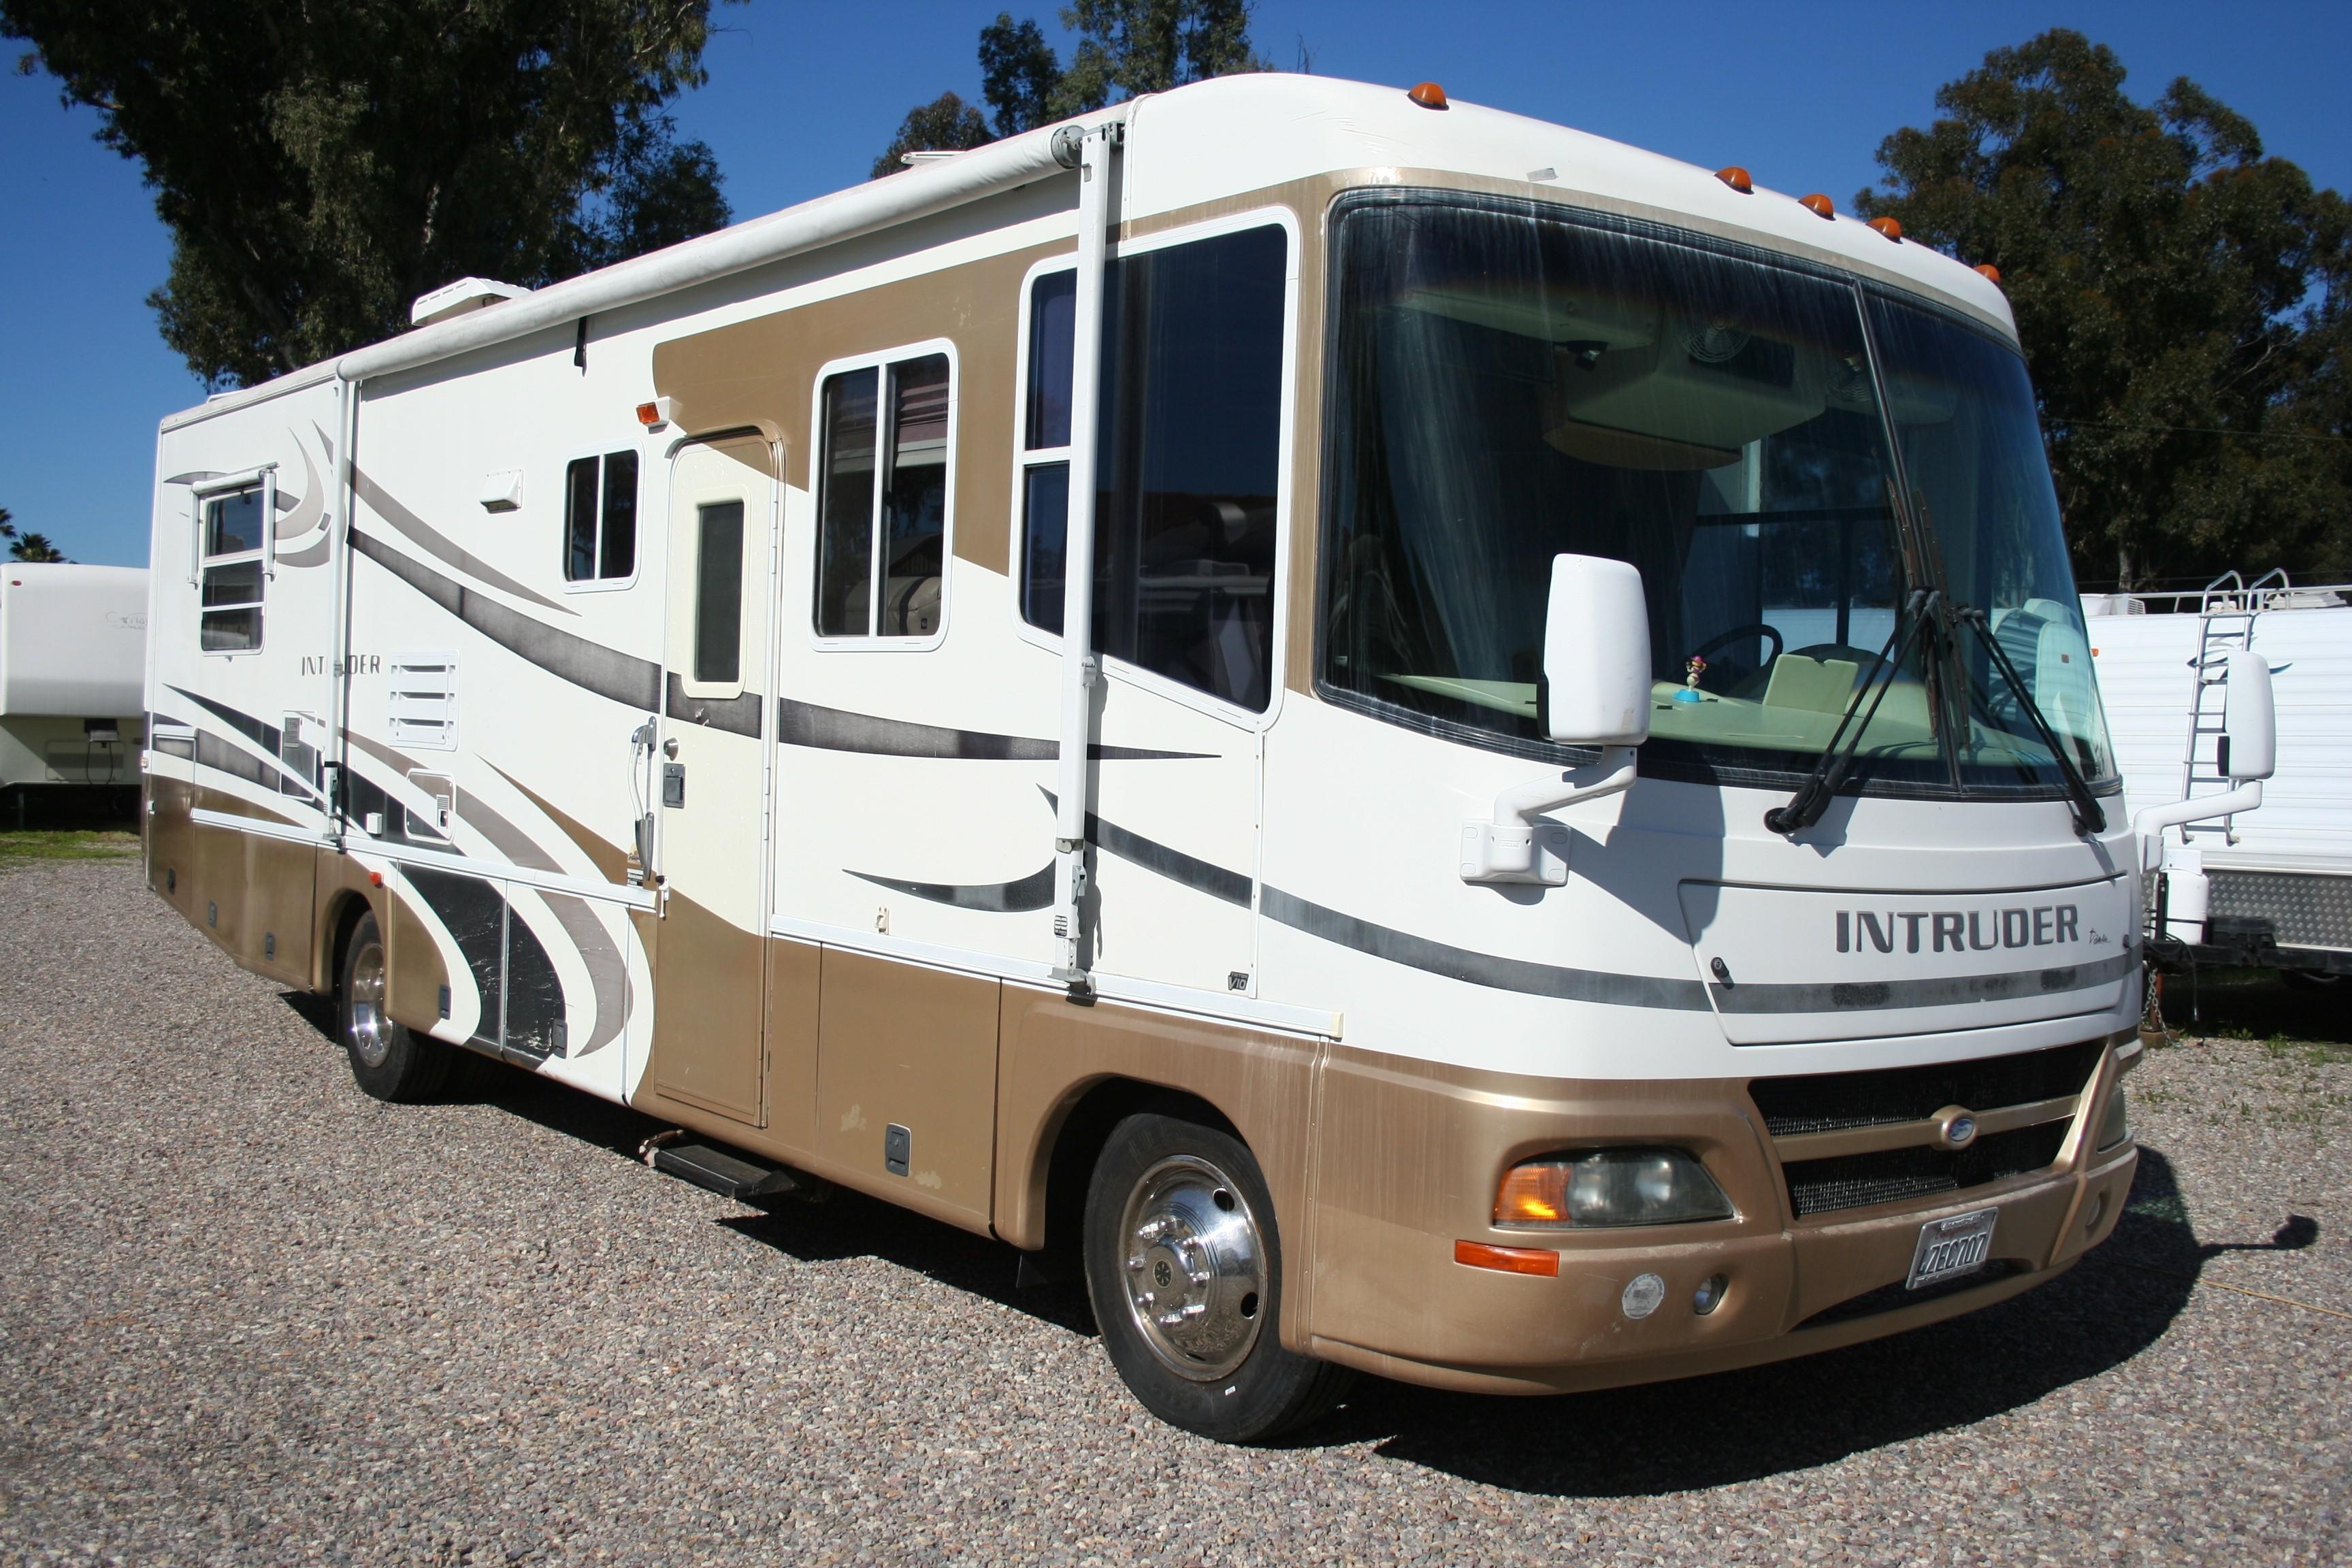 Intruder For Sale - Damon Parts RVs - RV Trader on